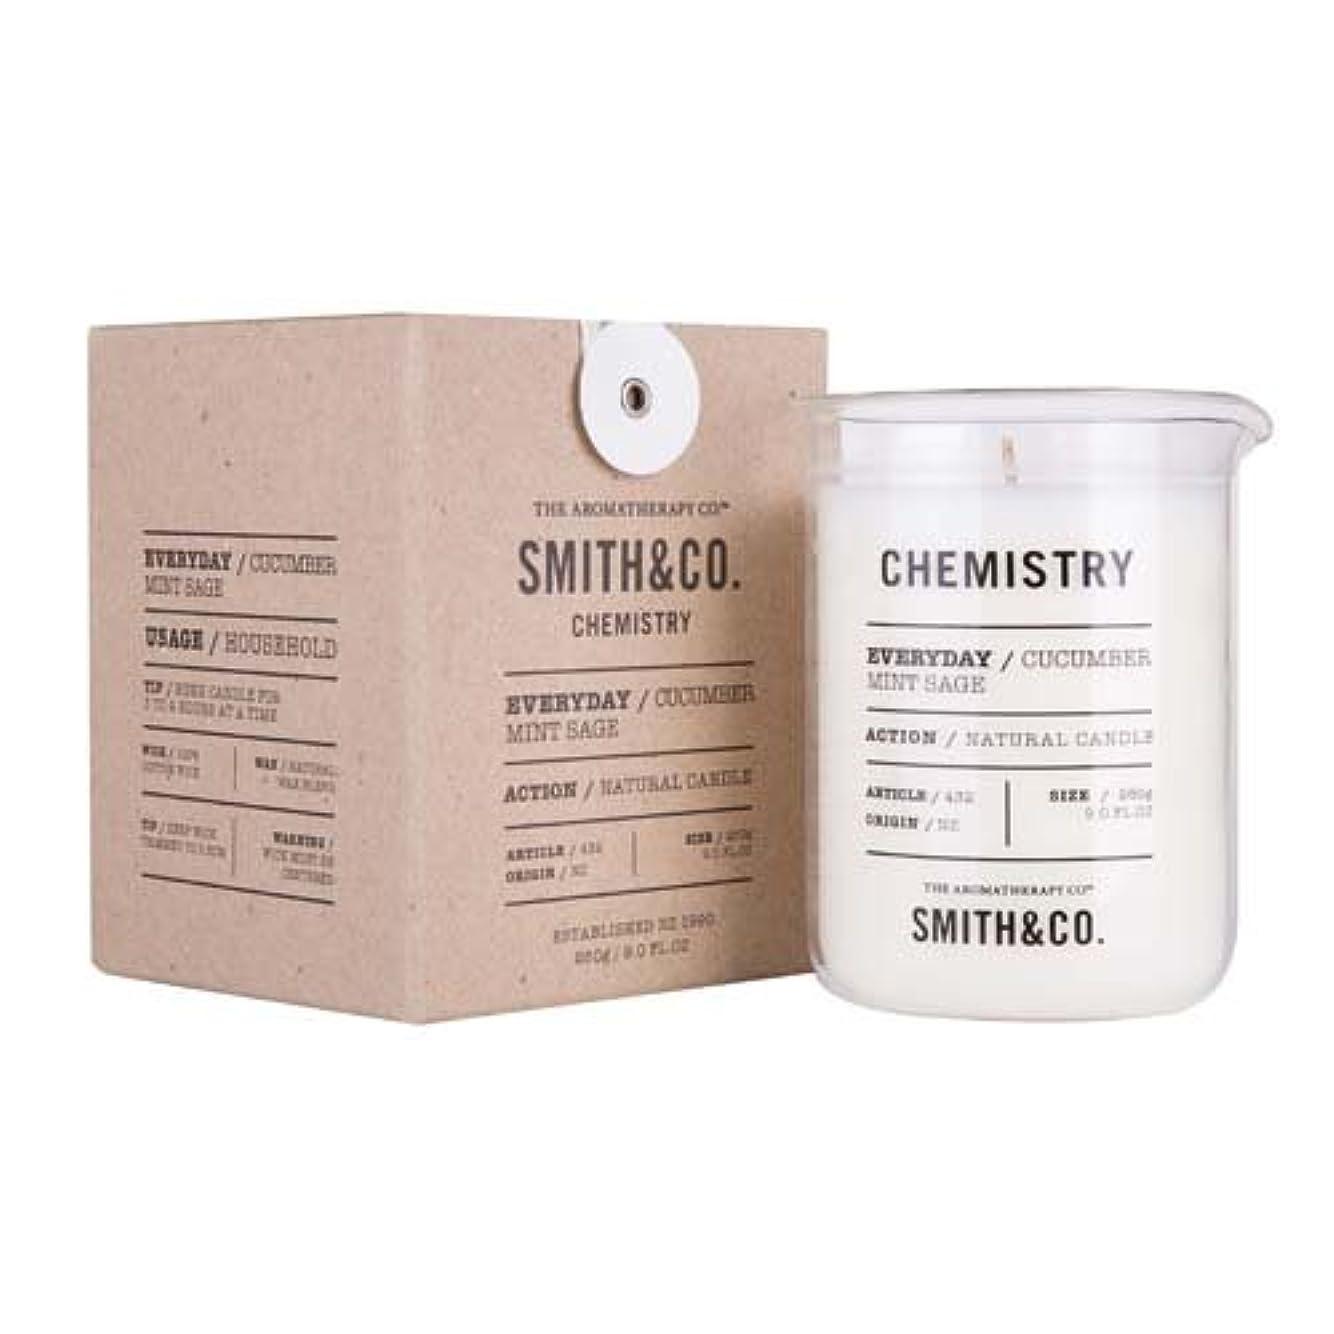 Smith&Co. Chemistry Candle ケミストリーキャンドル Cucumber Mint Sage